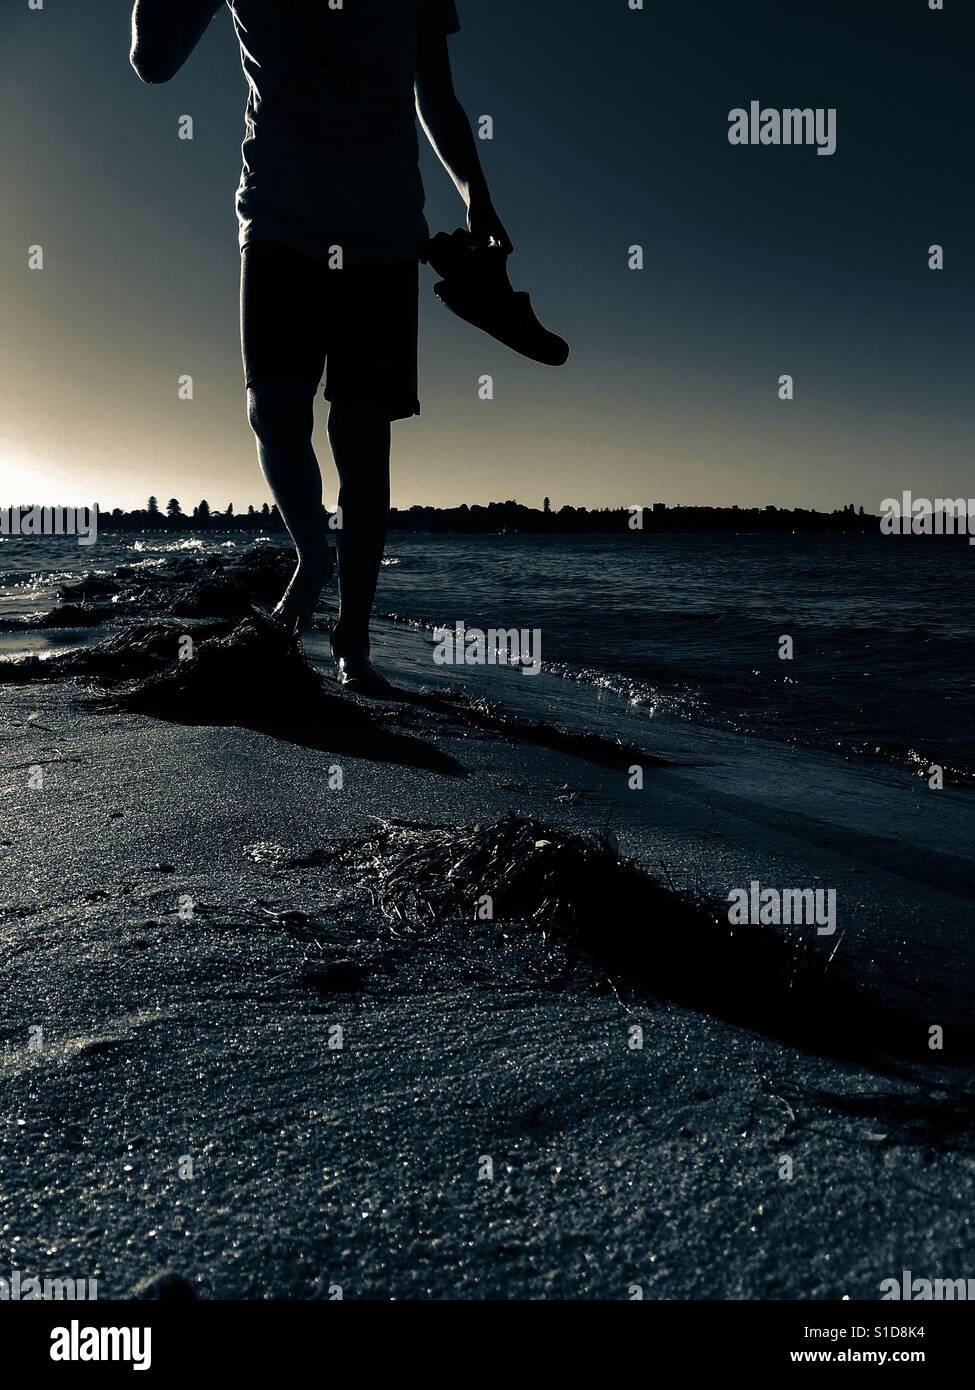 Walker auf Sandbank bei Sonnenuntergang / Sonnenaufgang Stockfoto